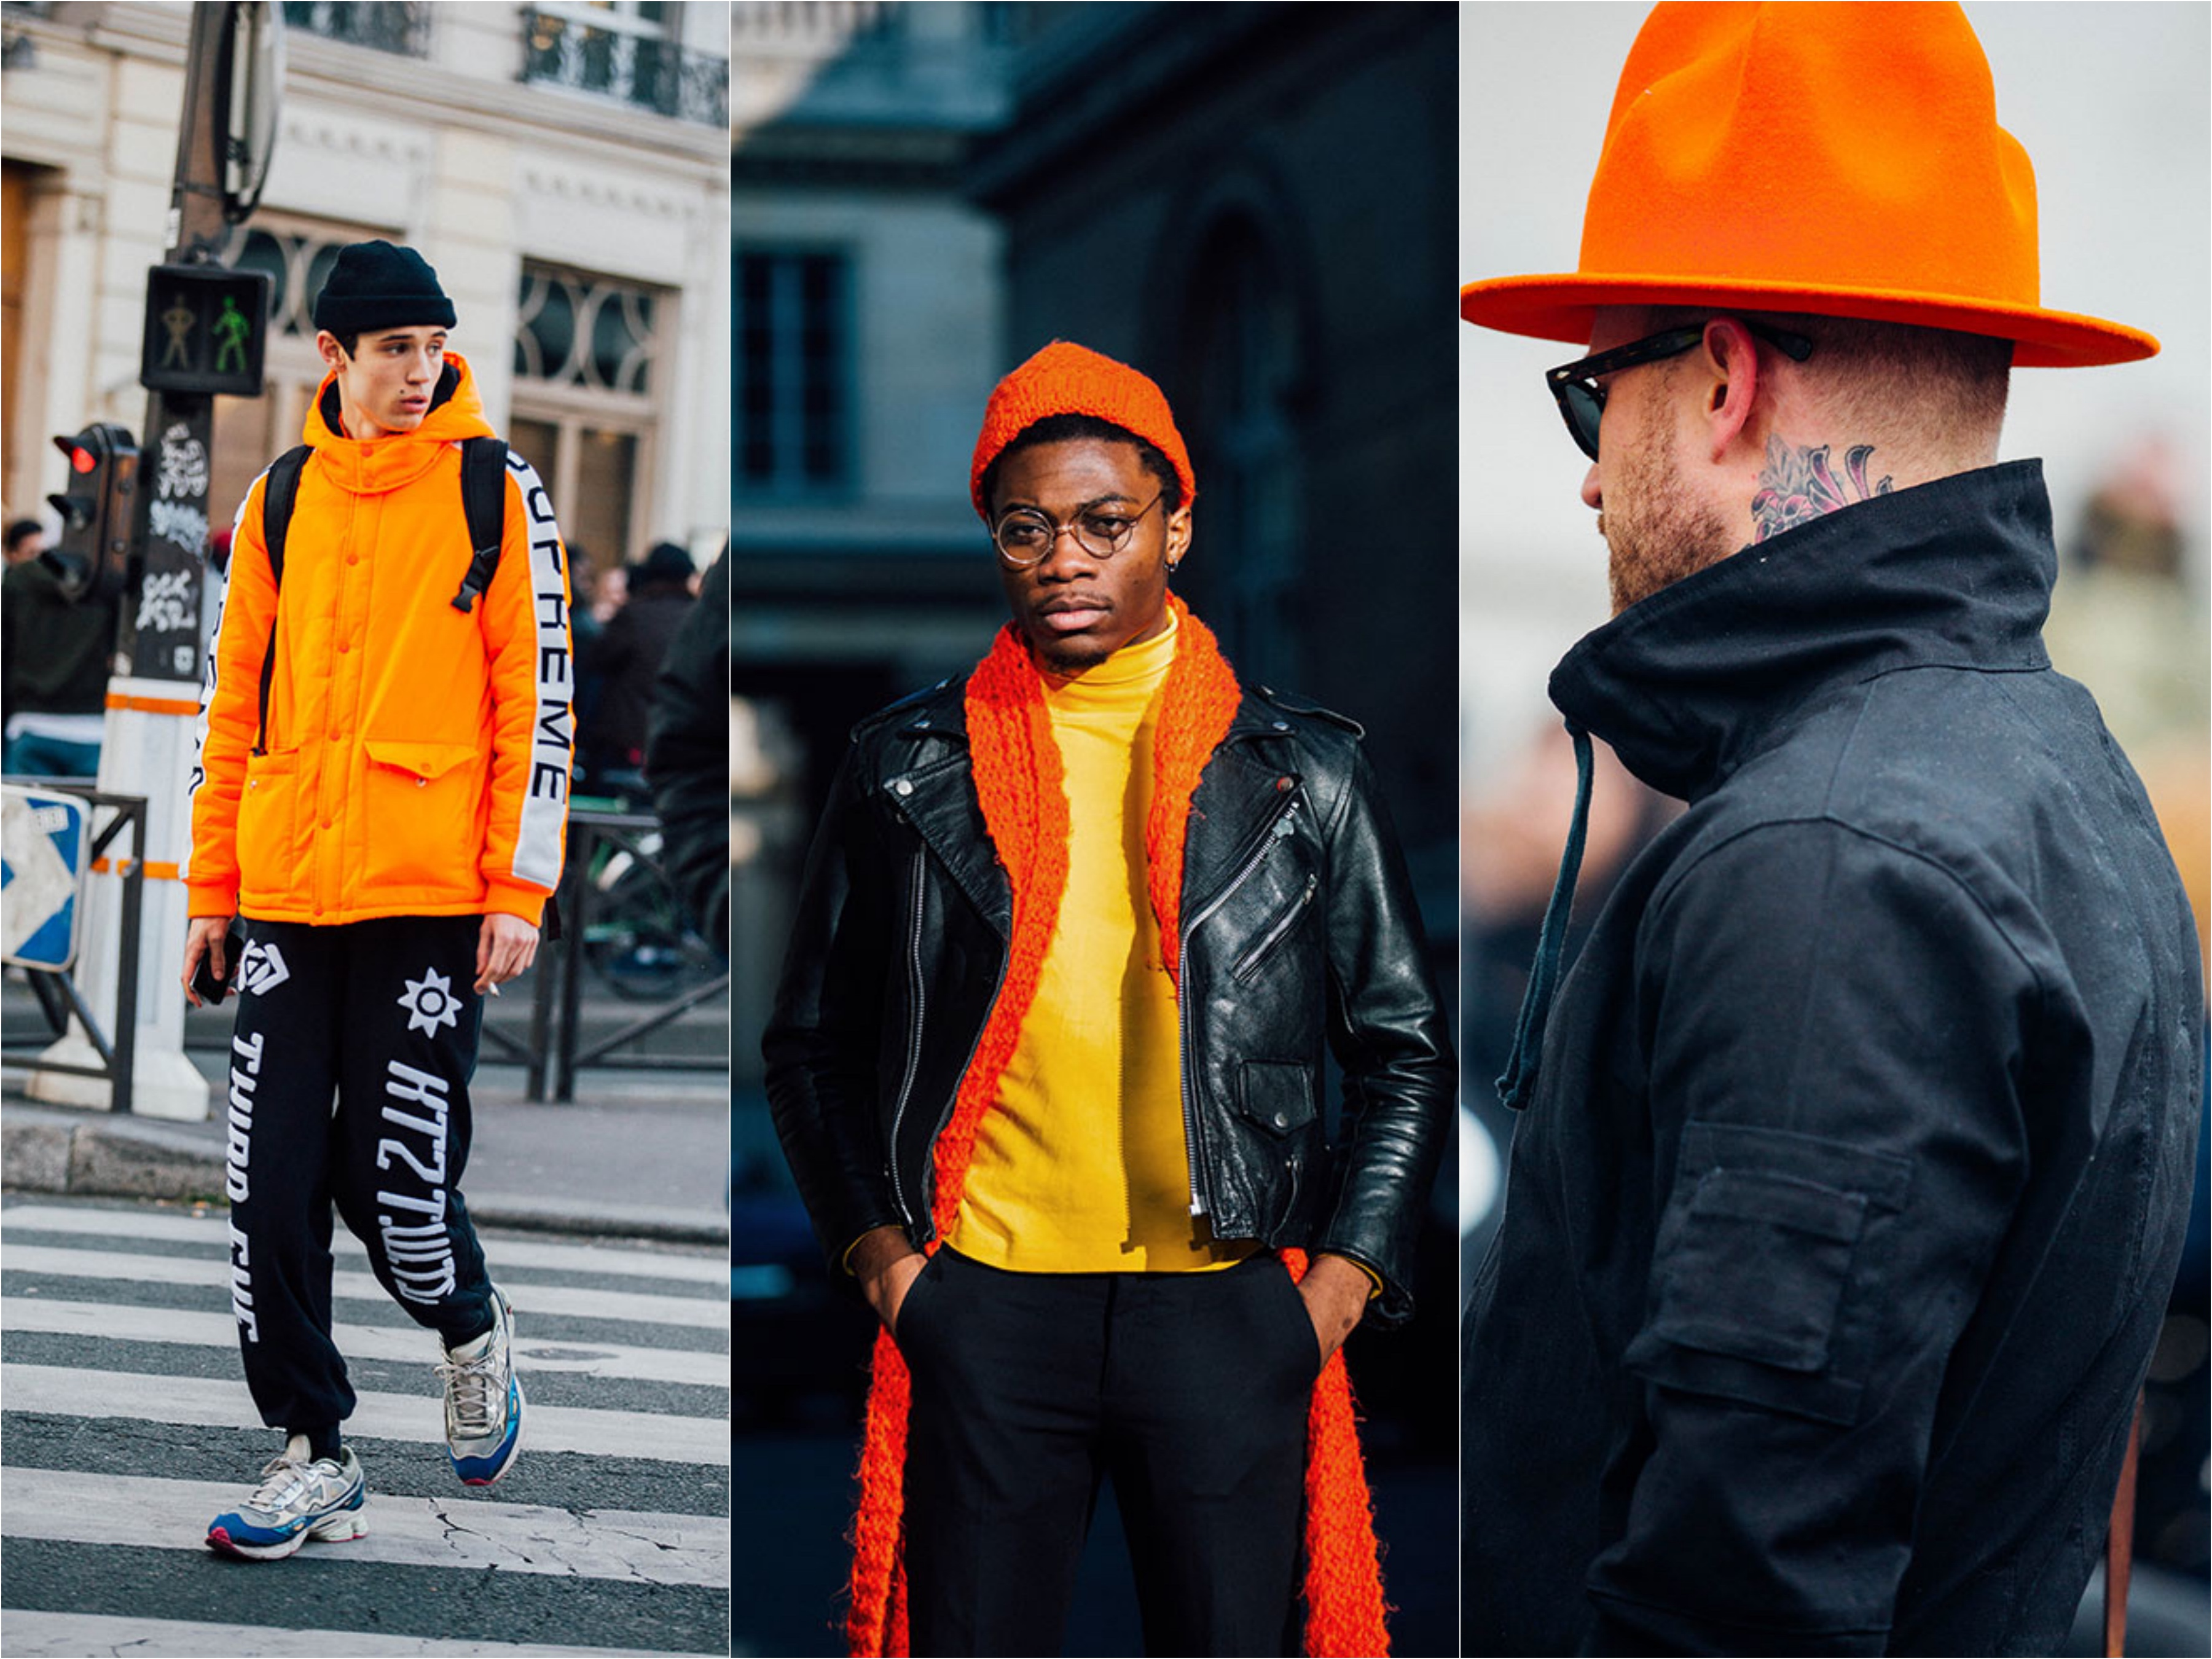 collage_fotorss-orange